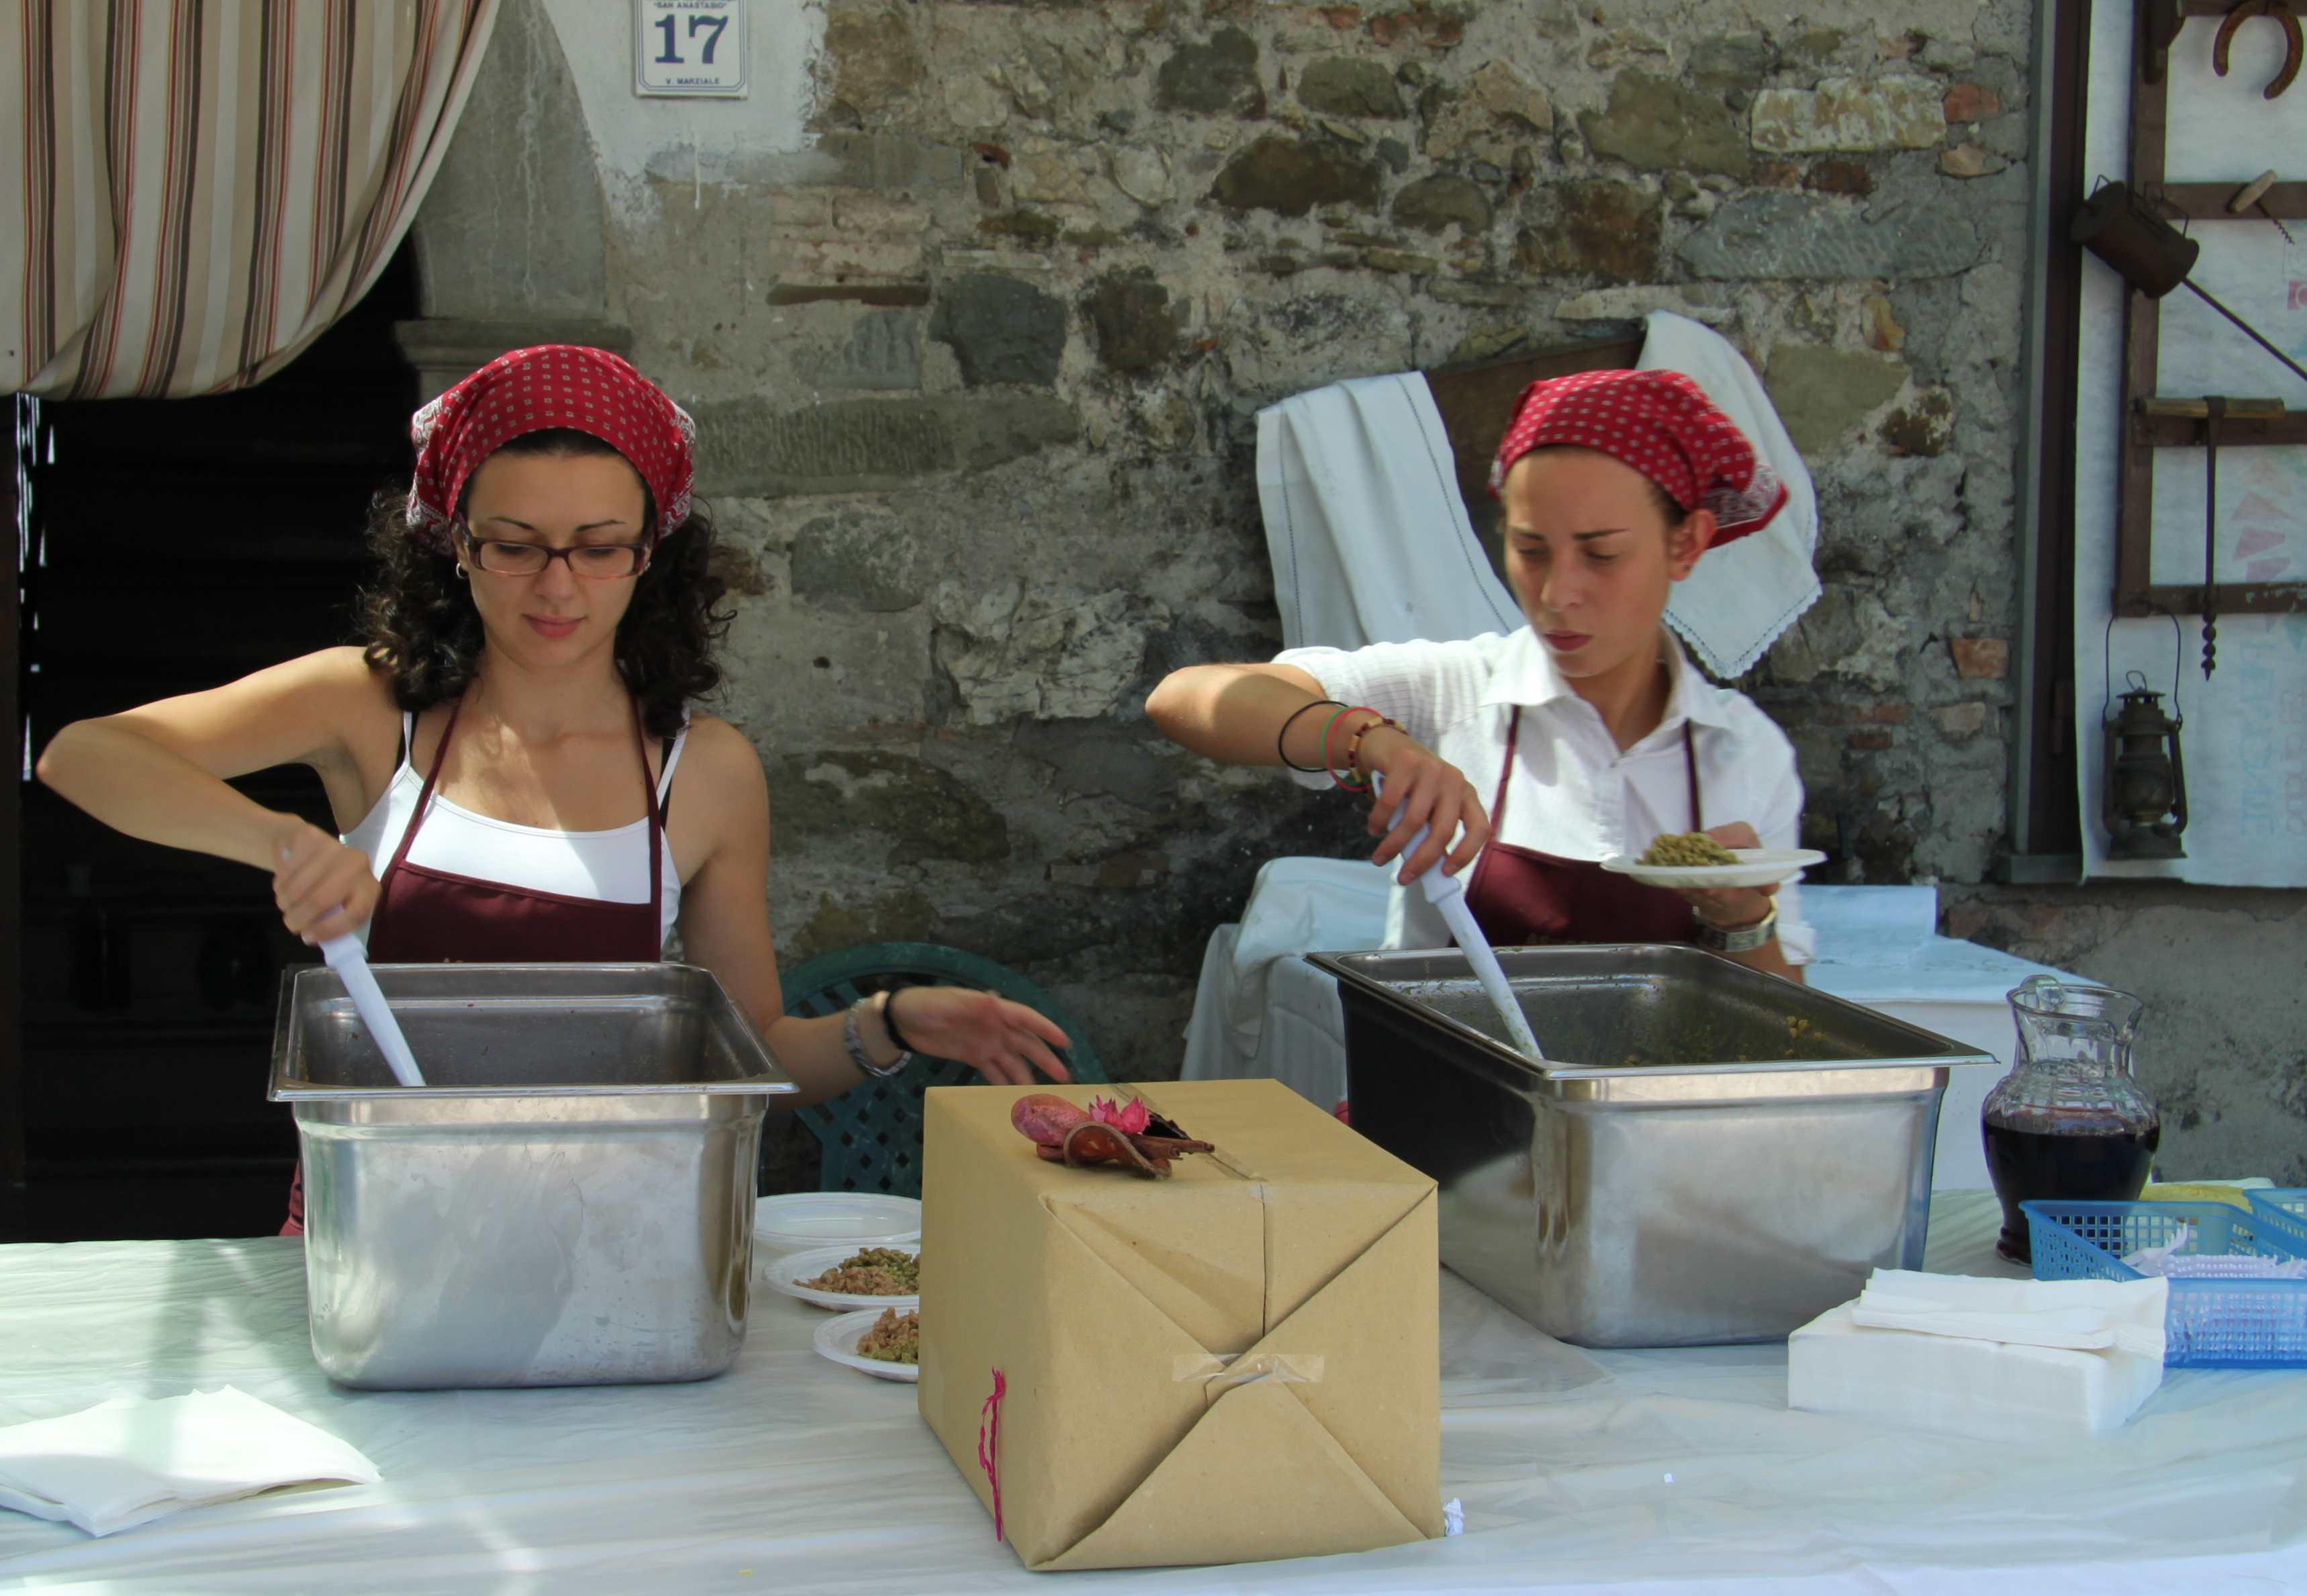 GARFAGNANA, ITALY – fun among the foodies | Richard Tulloch's LIFE ...